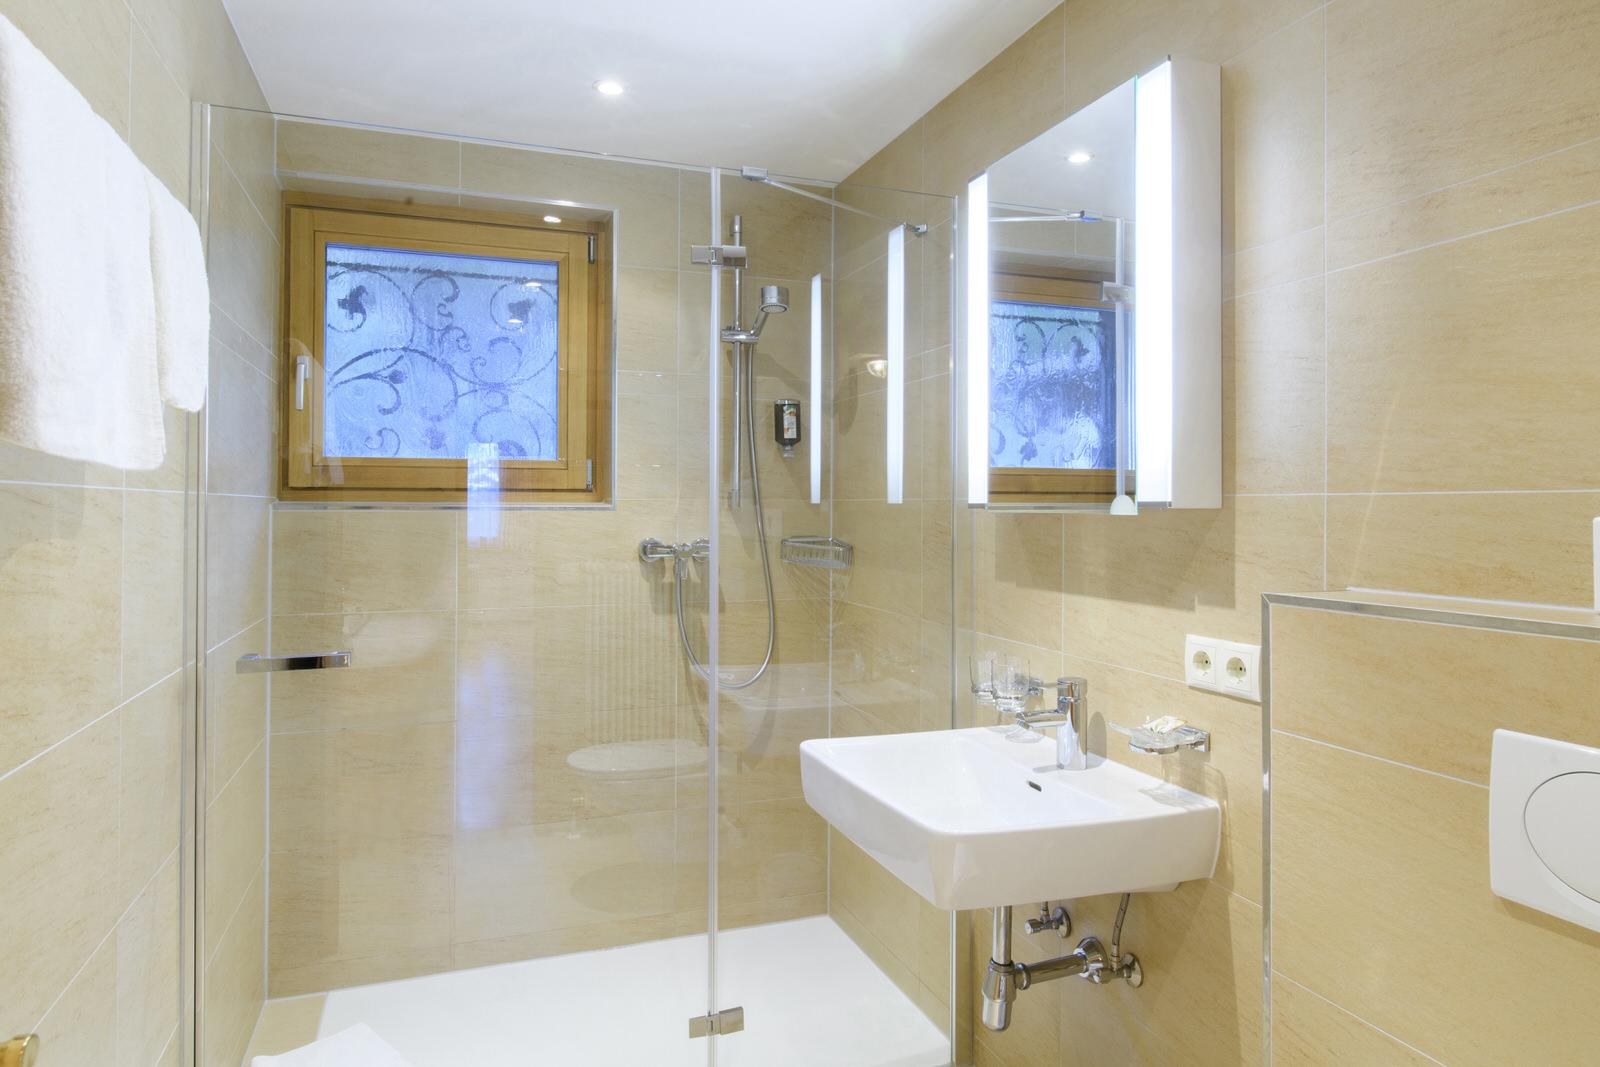 Rappakopf Forrest house in the Montafon - bathroom